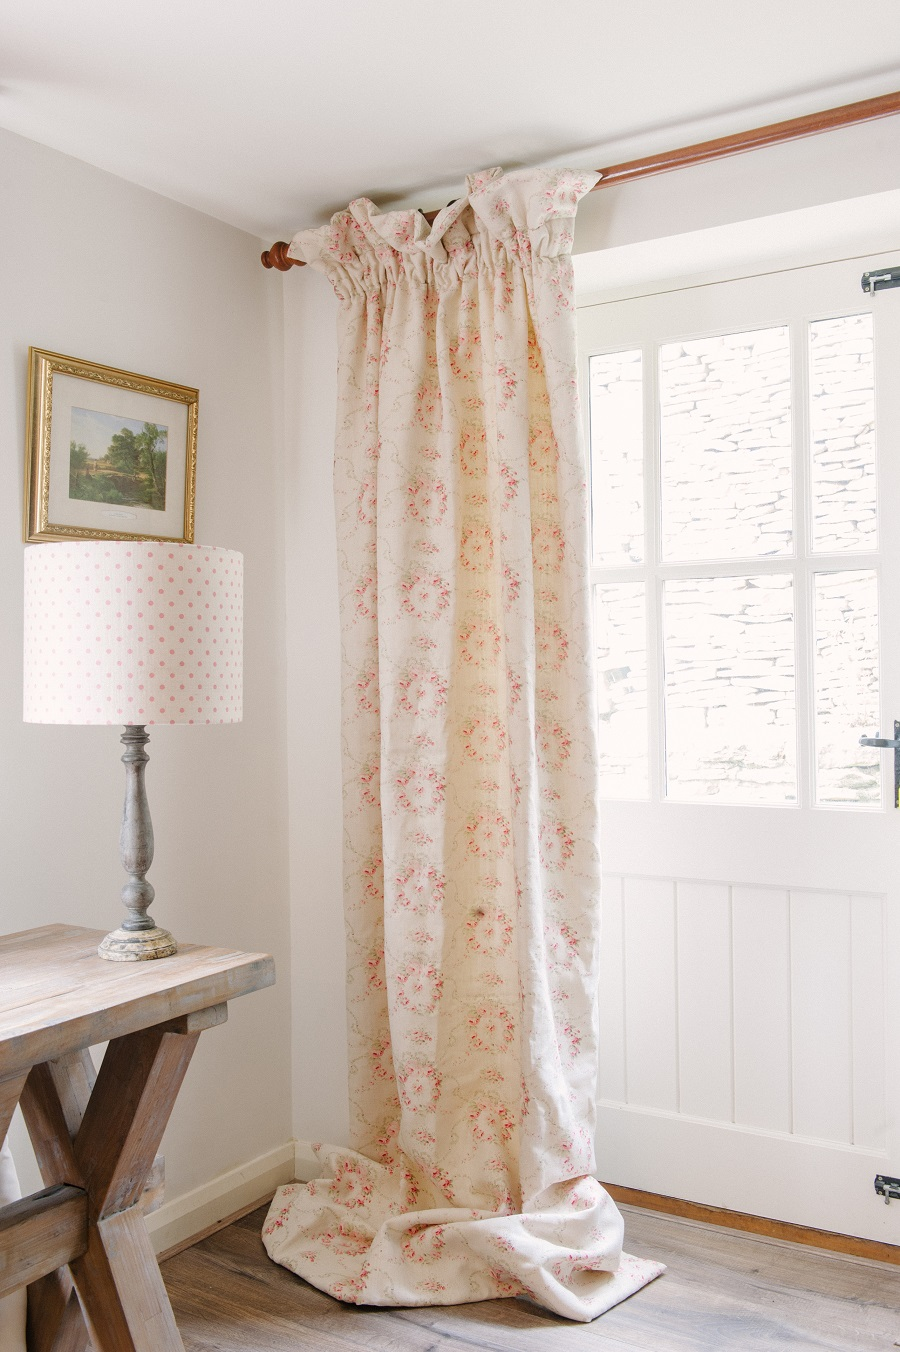 Bespoke Interior Design Handmade Curtains Amp Blinds